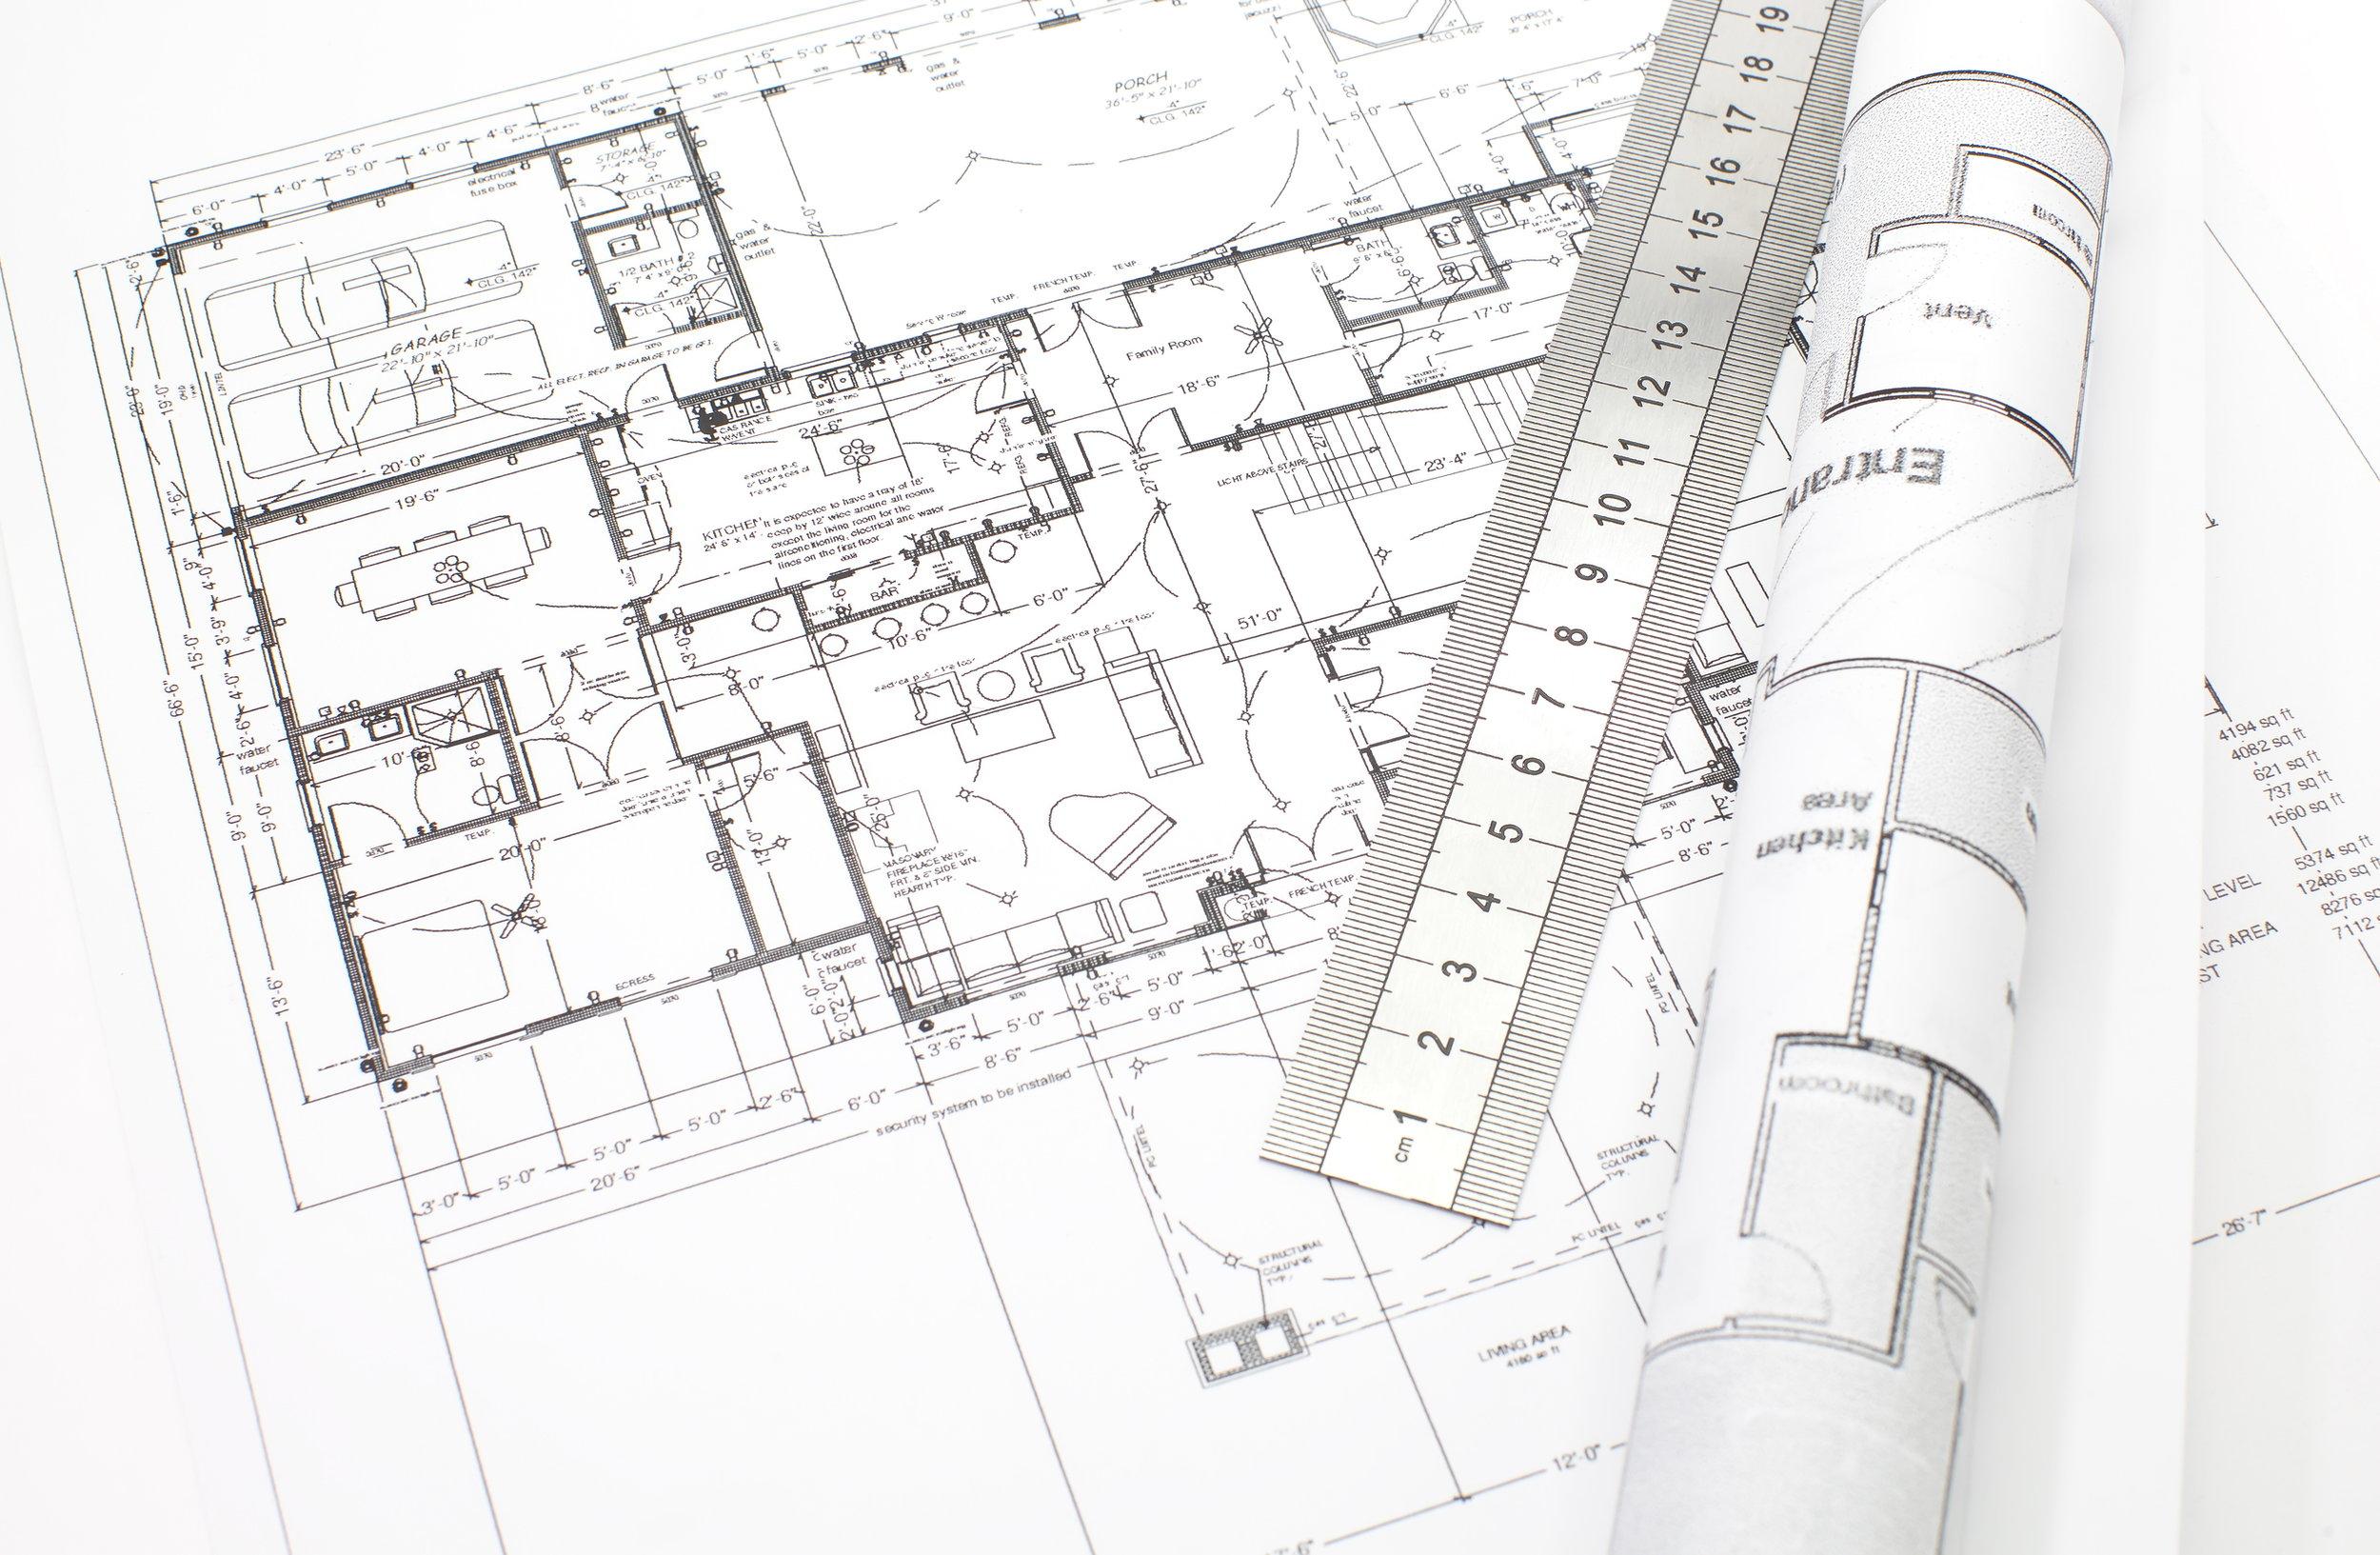 bigstock-Architecture-plan-and-rolls-of-53200192.jpg